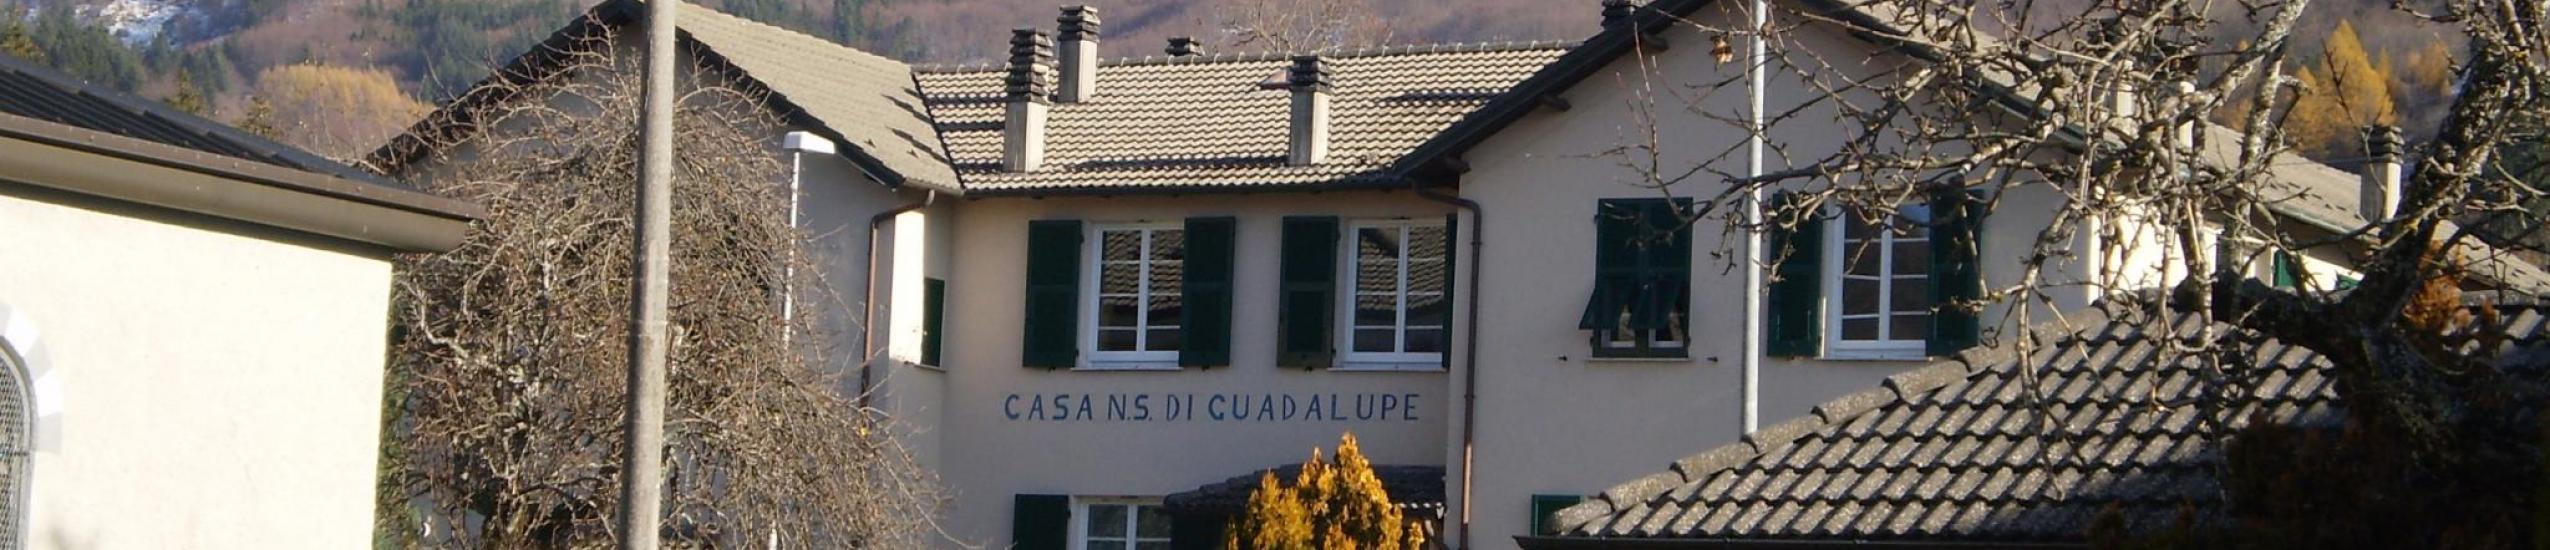 Casa di riposo Nostra Signora di Guadalupa